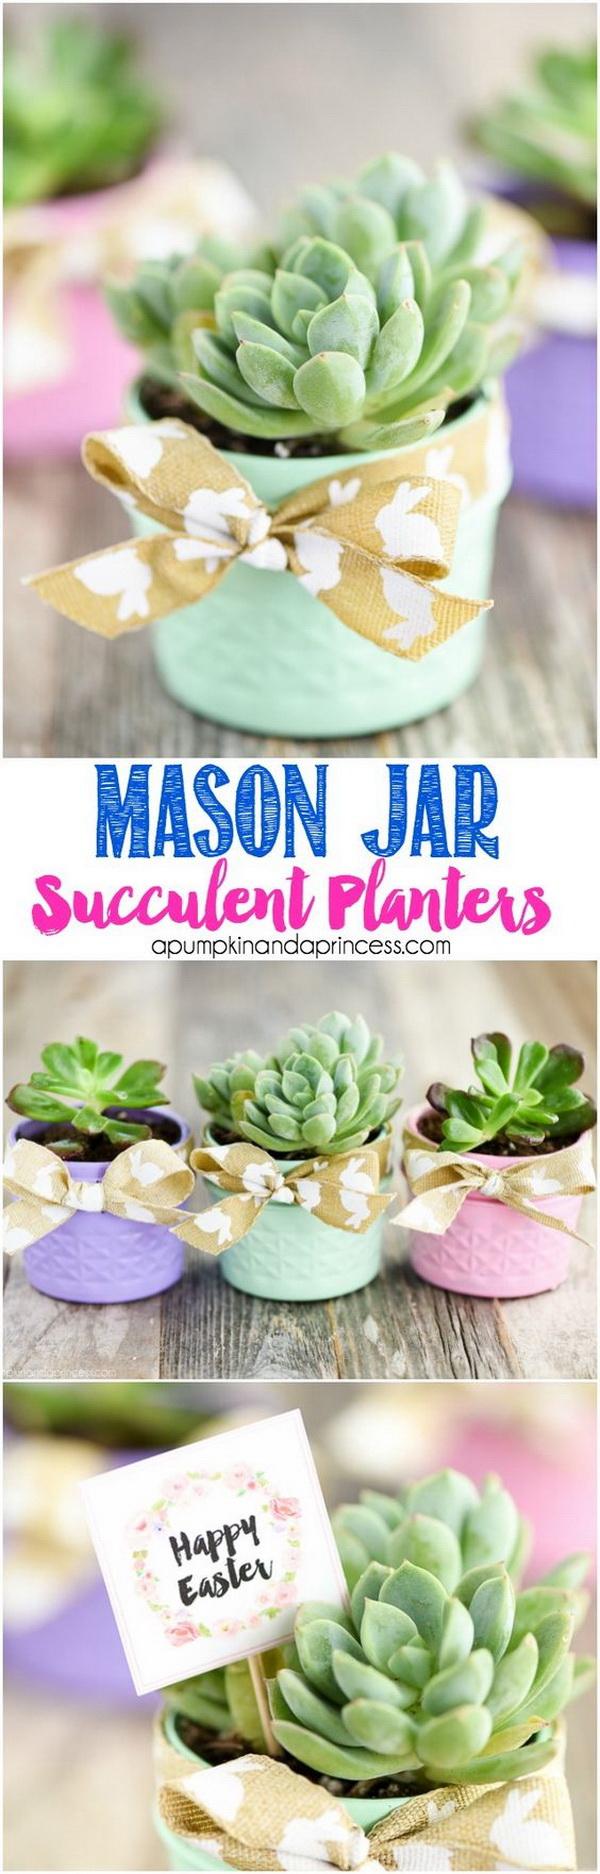 Mason Jar Succulent Planters.